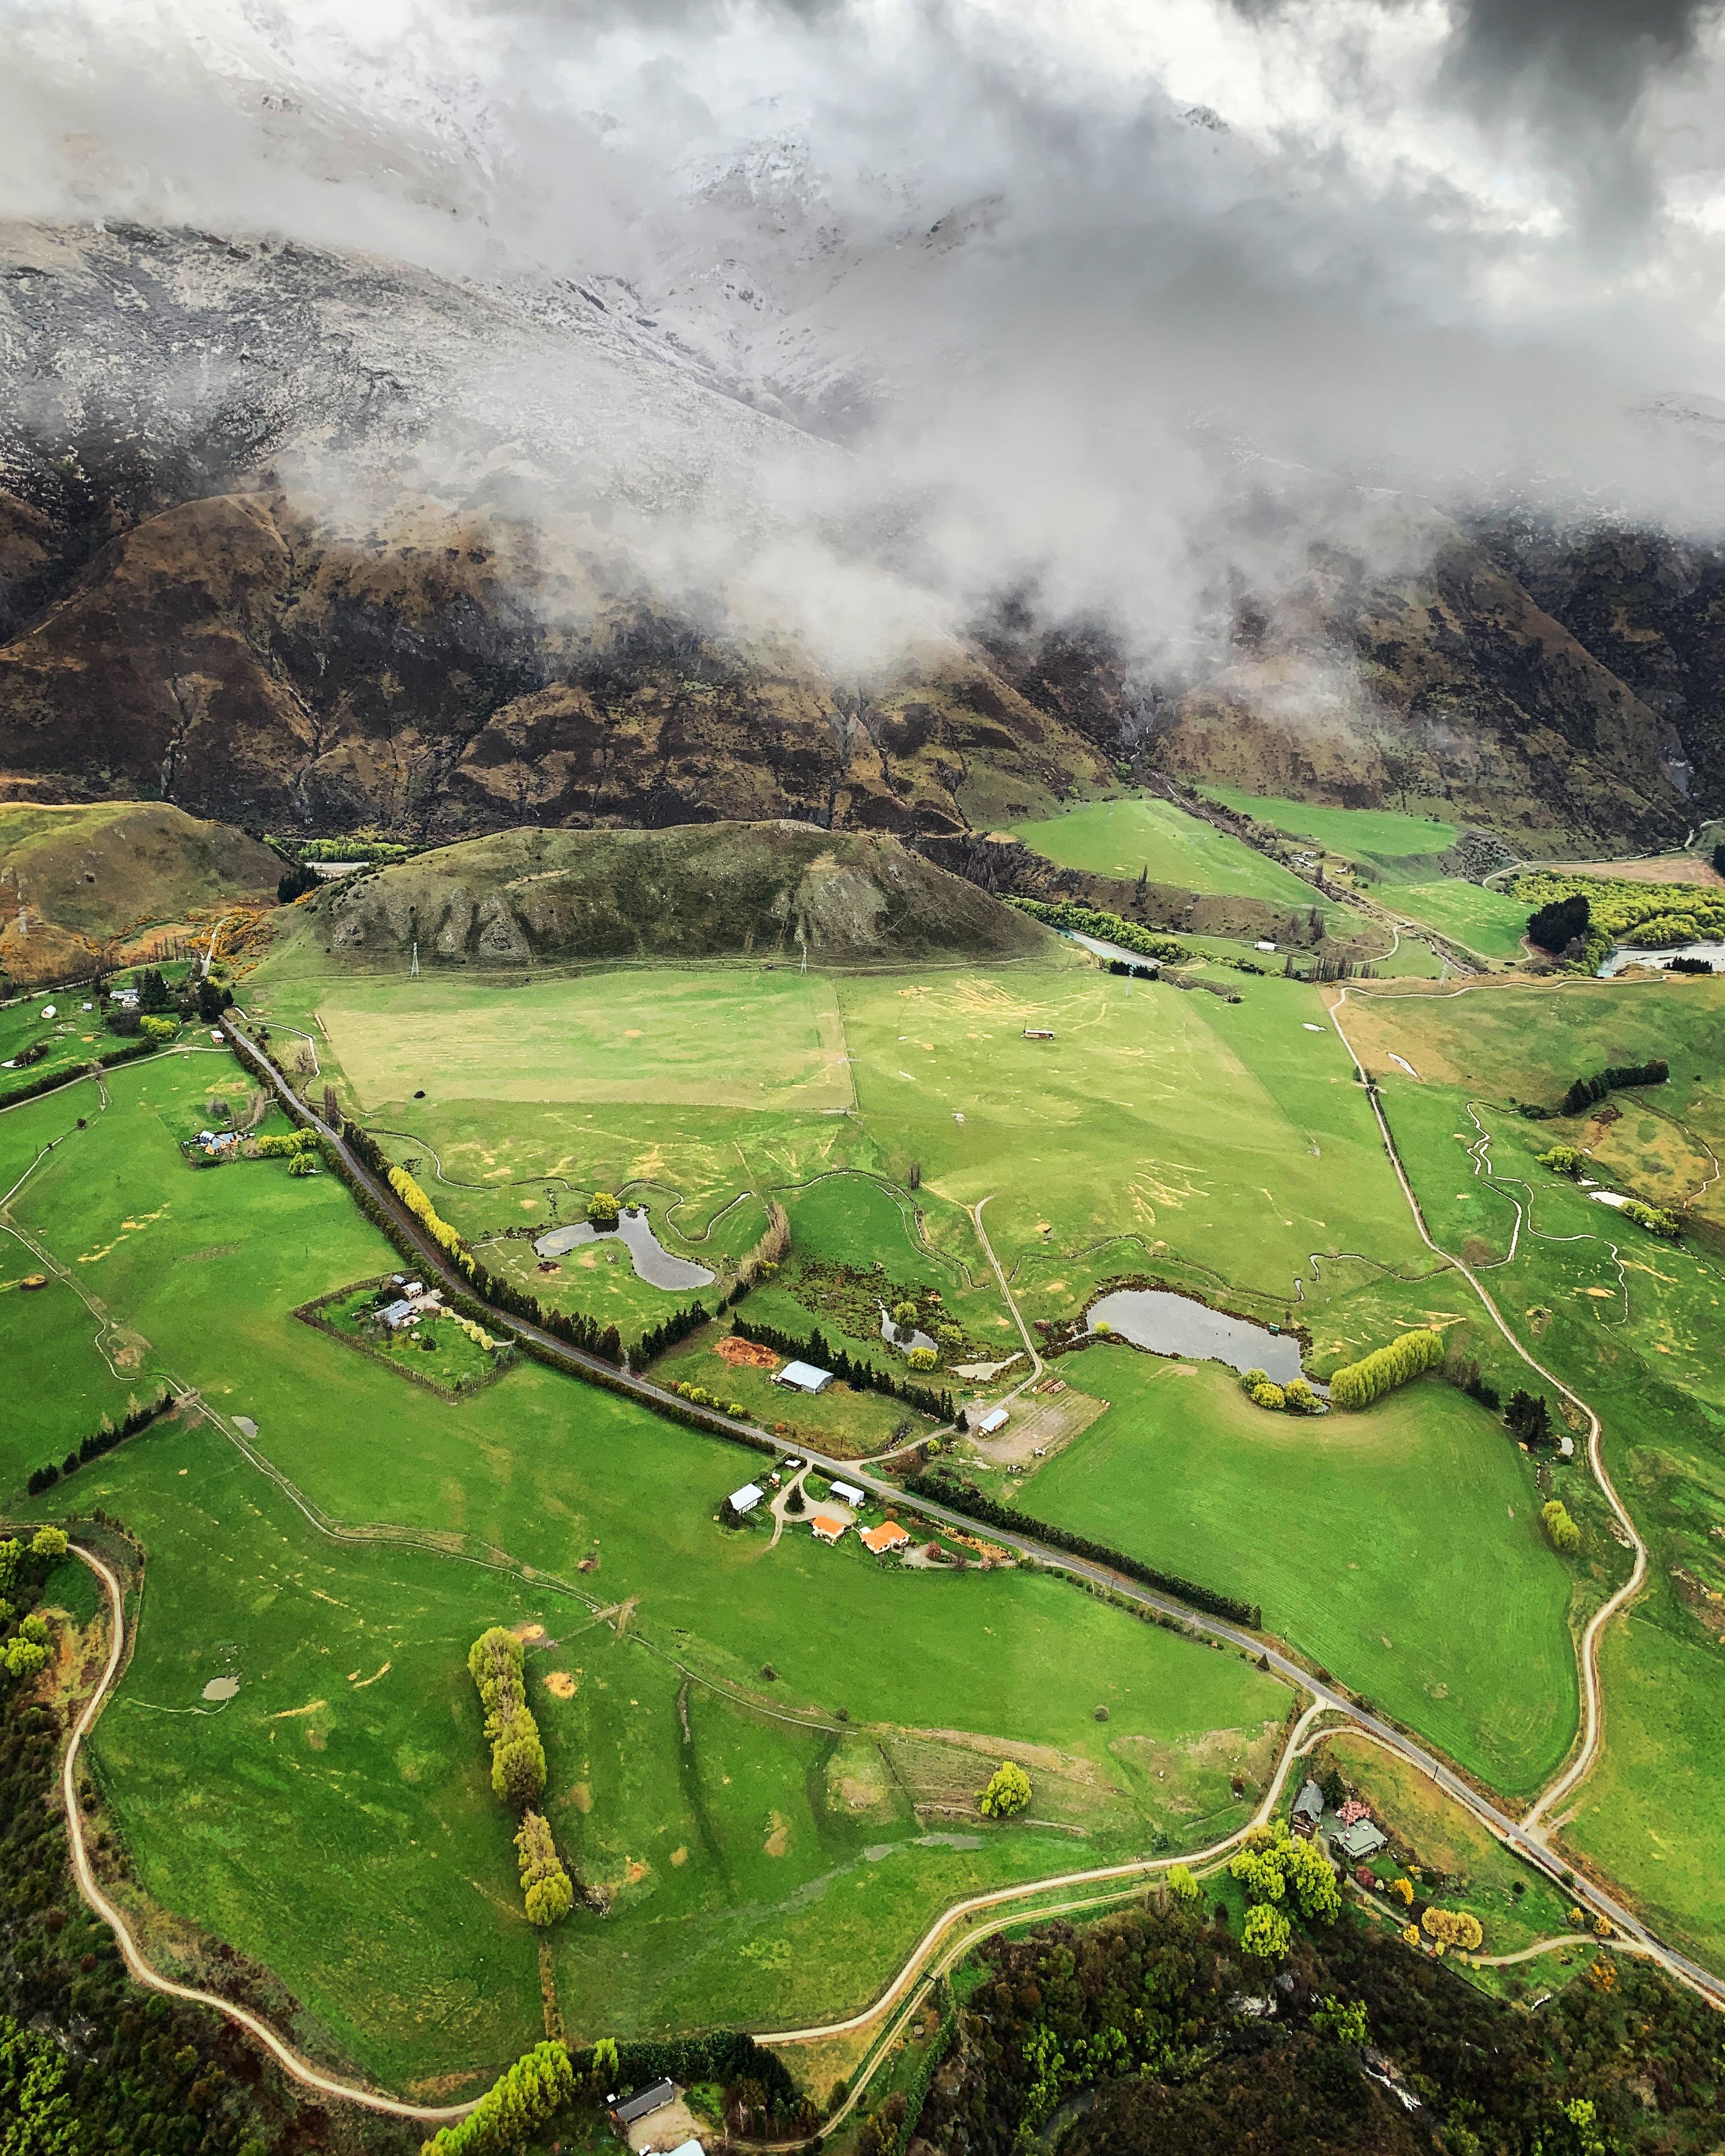 bird s eye view of cropland during daytime